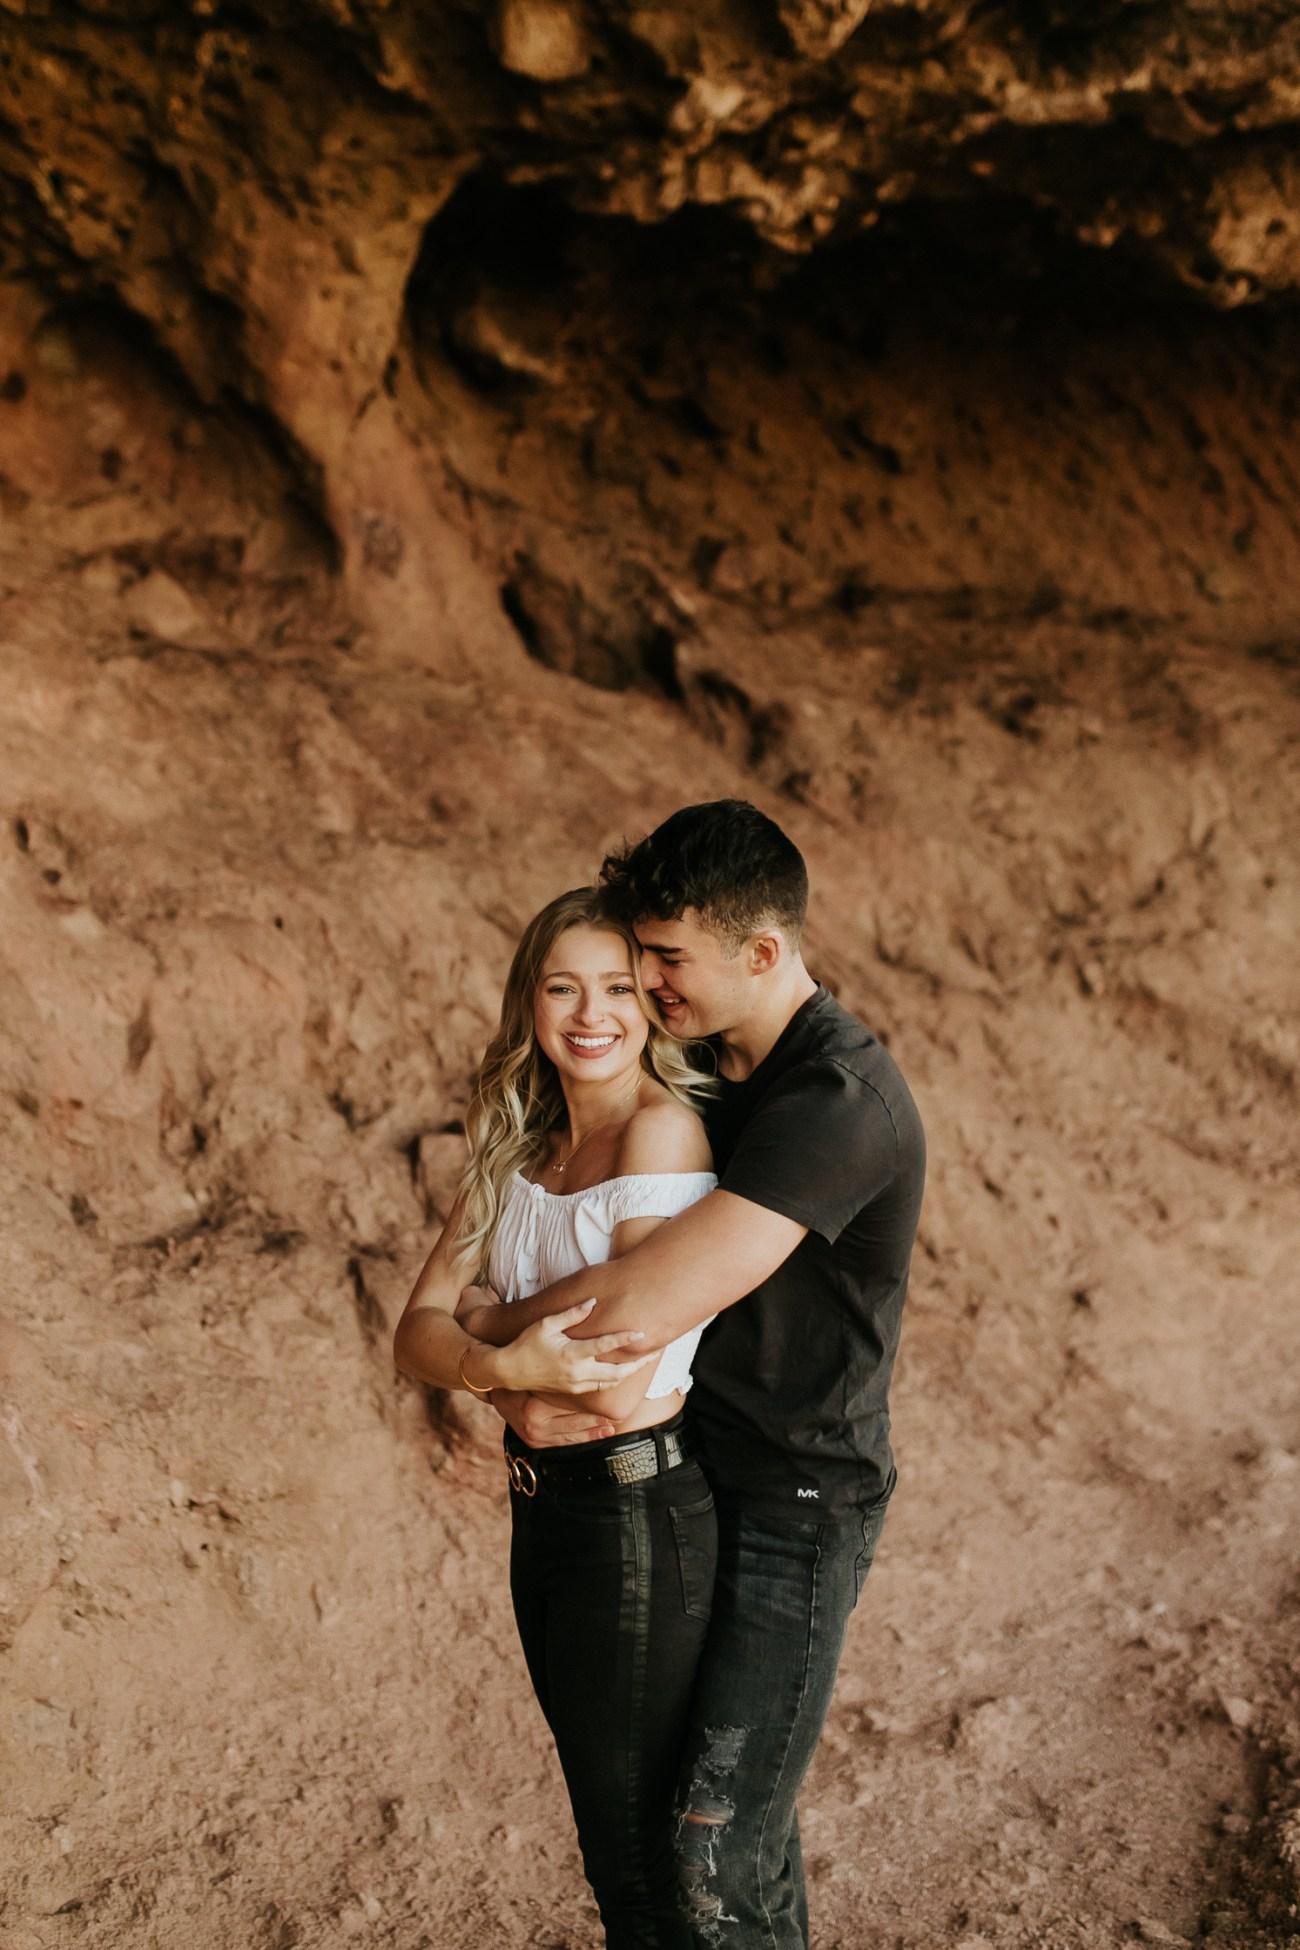 Megan Claire Photography | Arizona Wedding and Engagement Photographer. adventurous arizona desert couples session red rocks @meganclairephoto